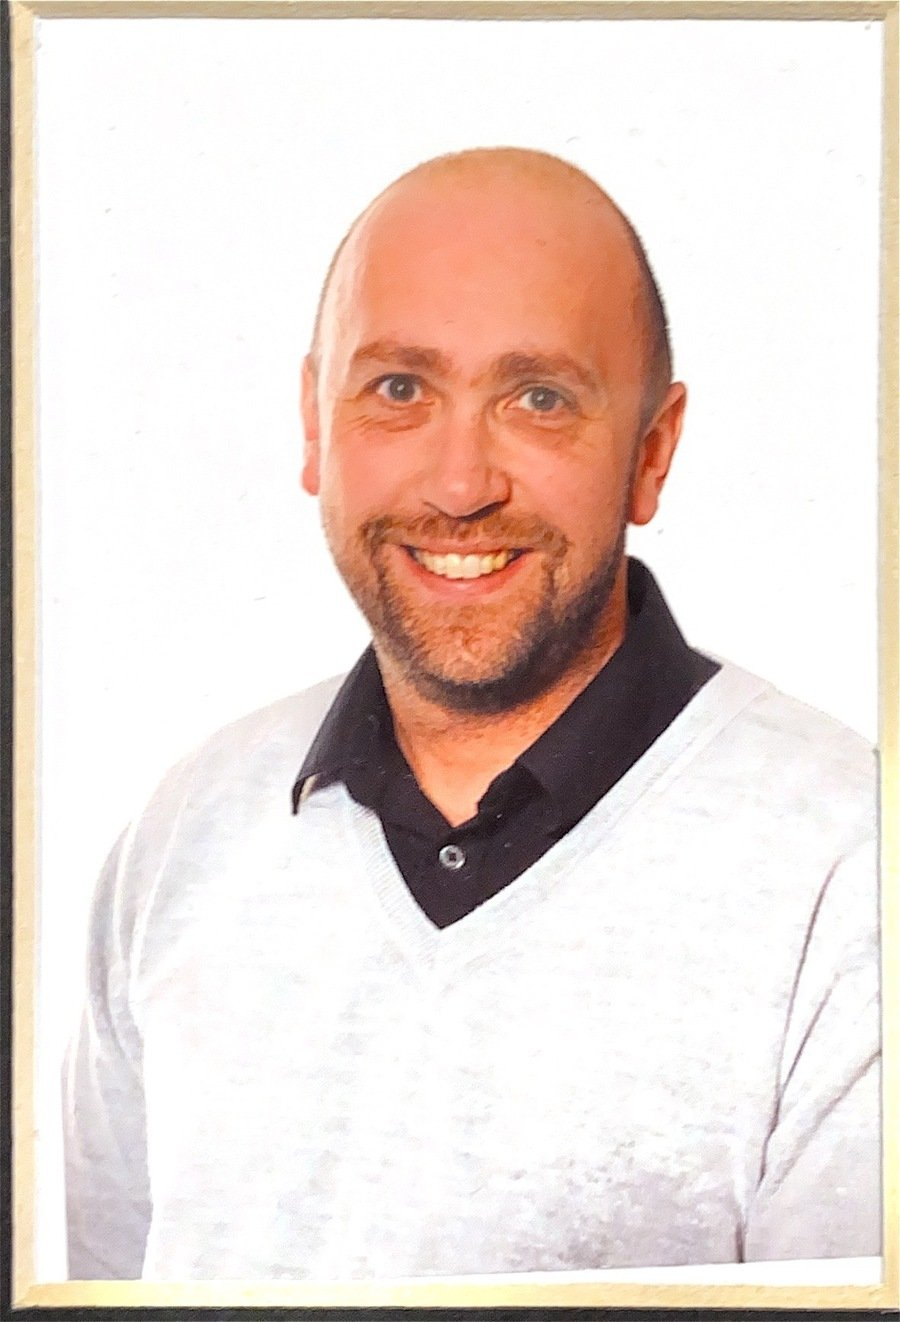 Mr Jones (Inclusion Manager)